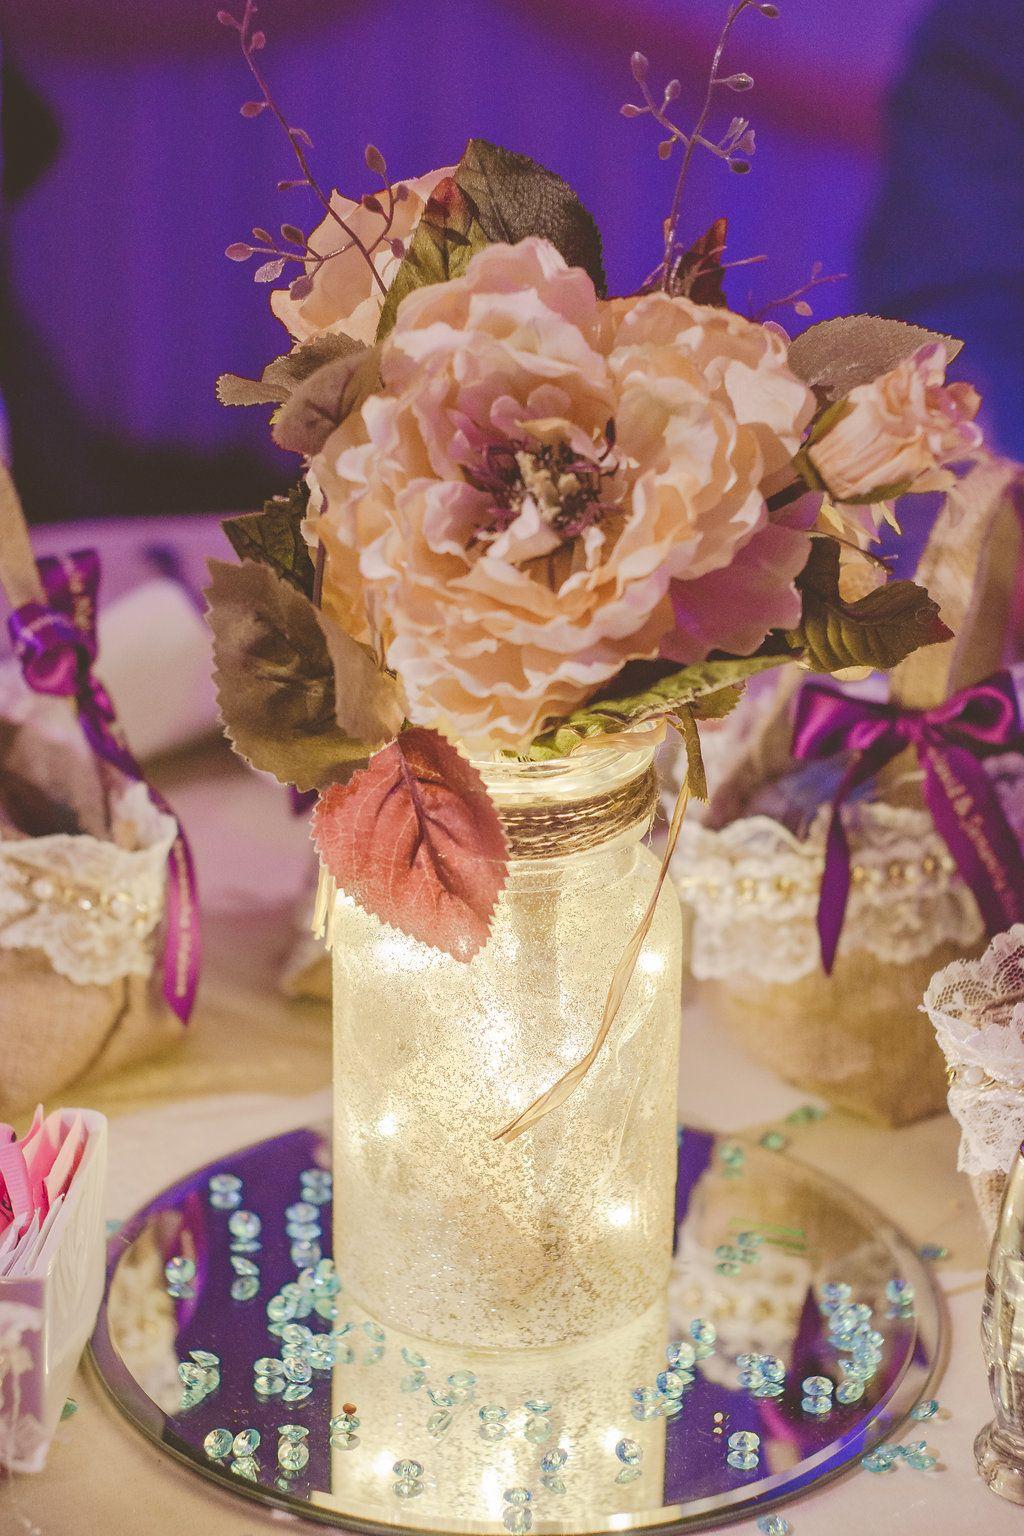 Wedding Reception Center Pieces Diy Glitter Mason Jars With Fairy Lights And Twine Silk Flowers Round Mirrors Bead